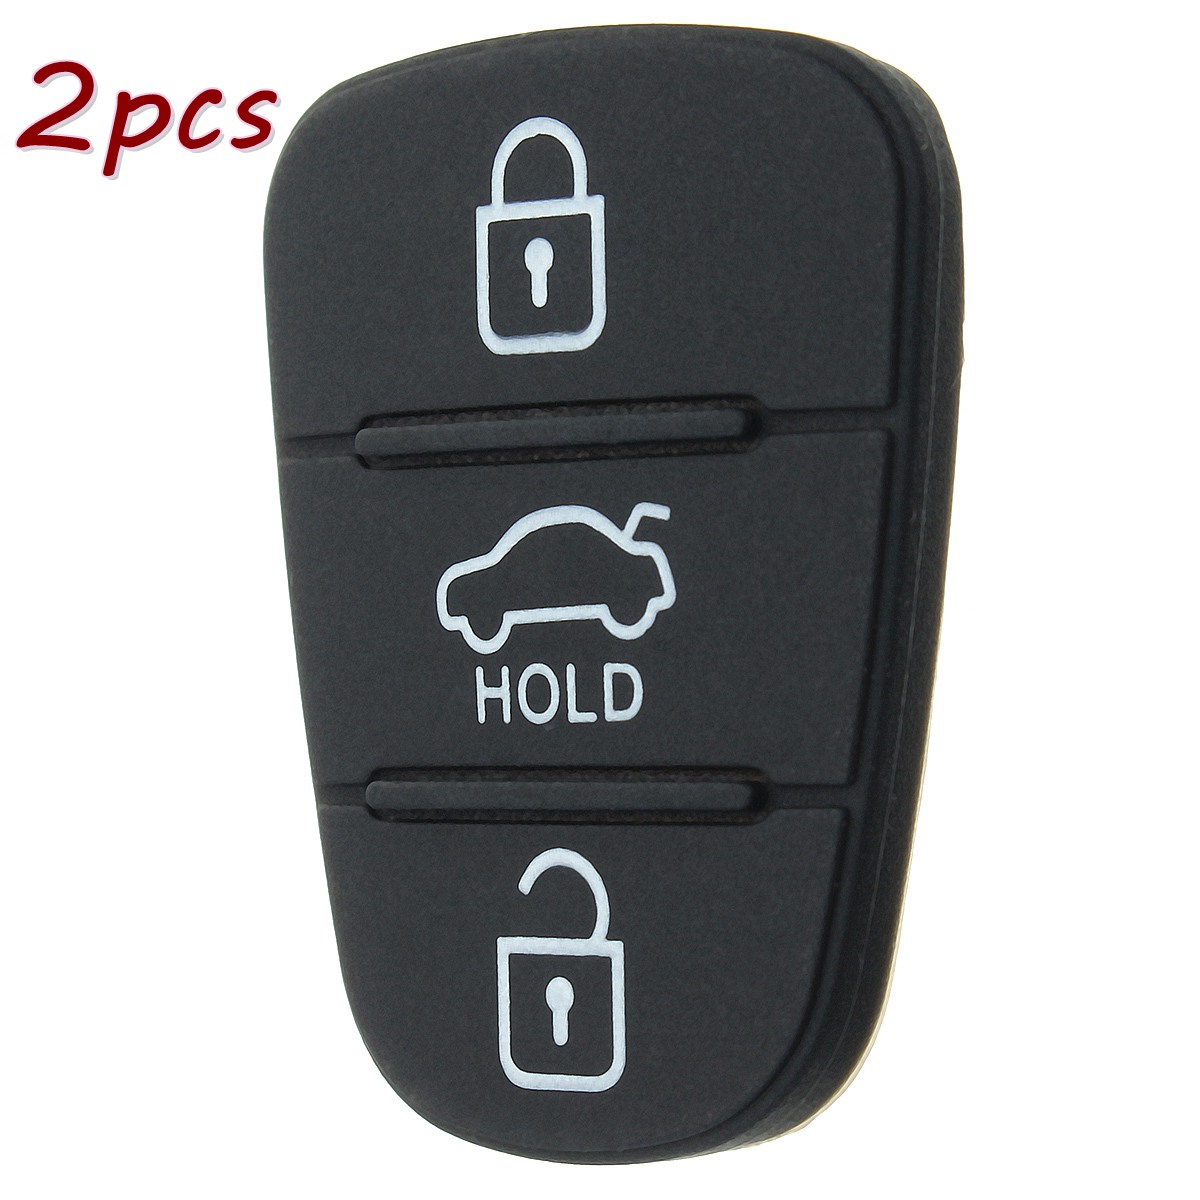 2pcs Rubber Key Button Pad For Hyundai Solaris Accent